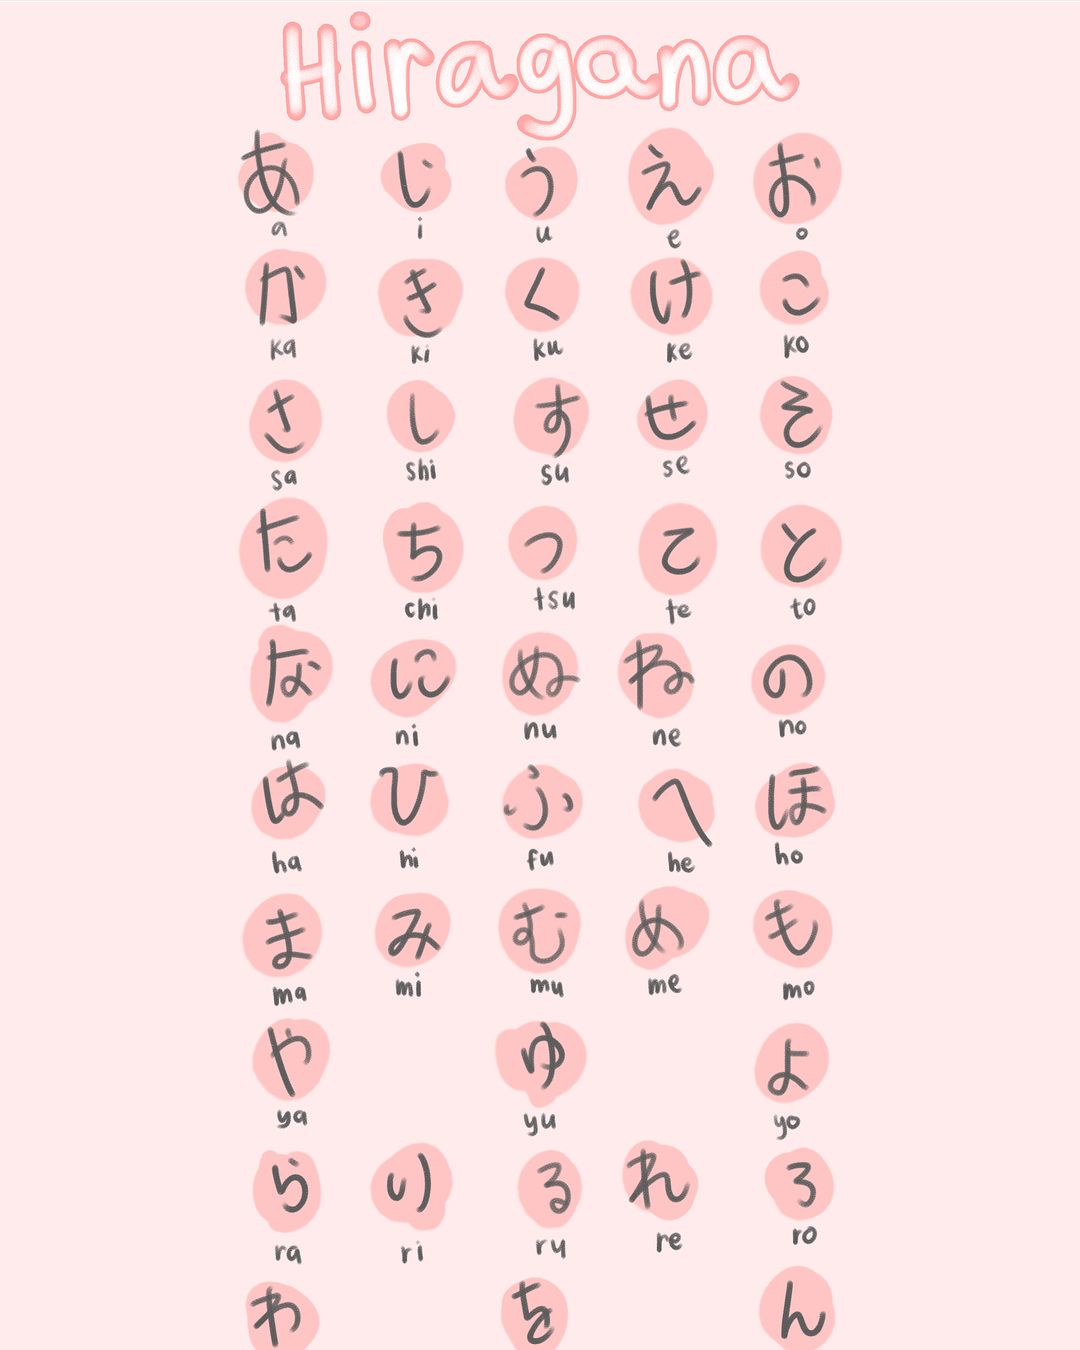 Hiragana Characters: This Is A Japanese Language Study Guide For Hiragana